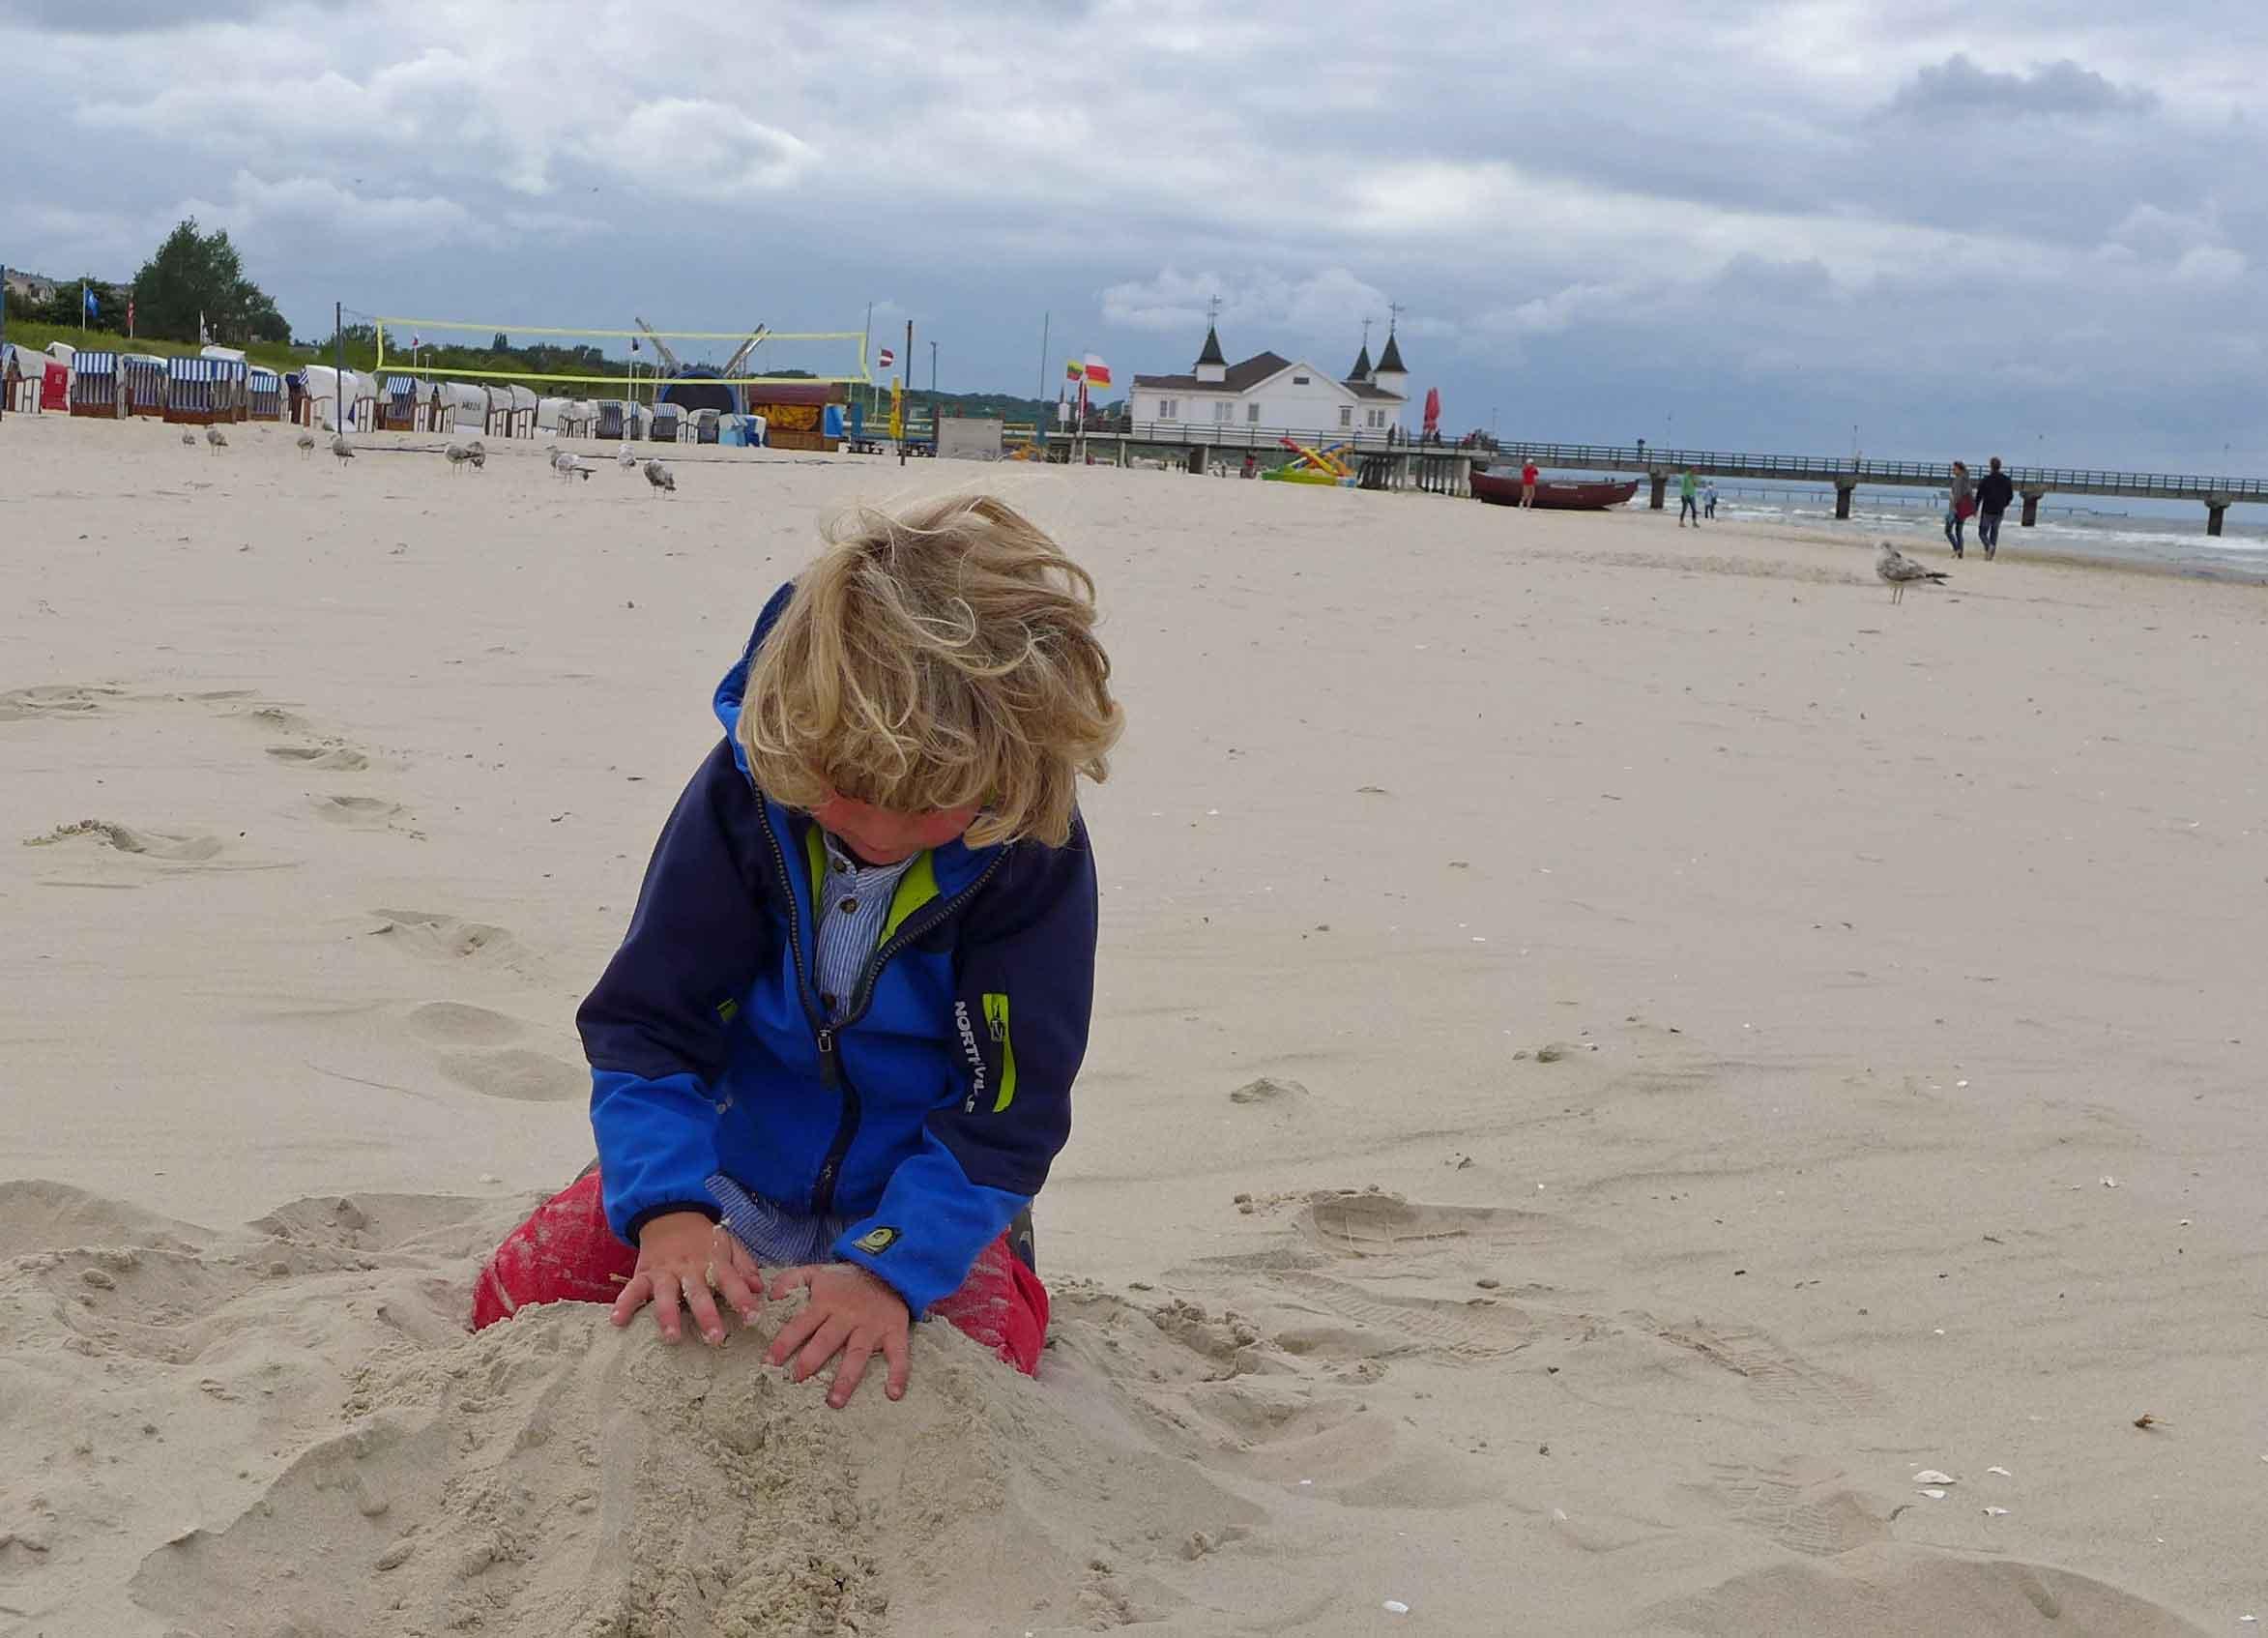 Frederik buddelt im Sand auf Usedom,  Familienurlaub Usedom, Tipps Familienreise, Aktivurlaub mit der Familie, Usedom-Urlaub, Reiseblog. Reisefeder